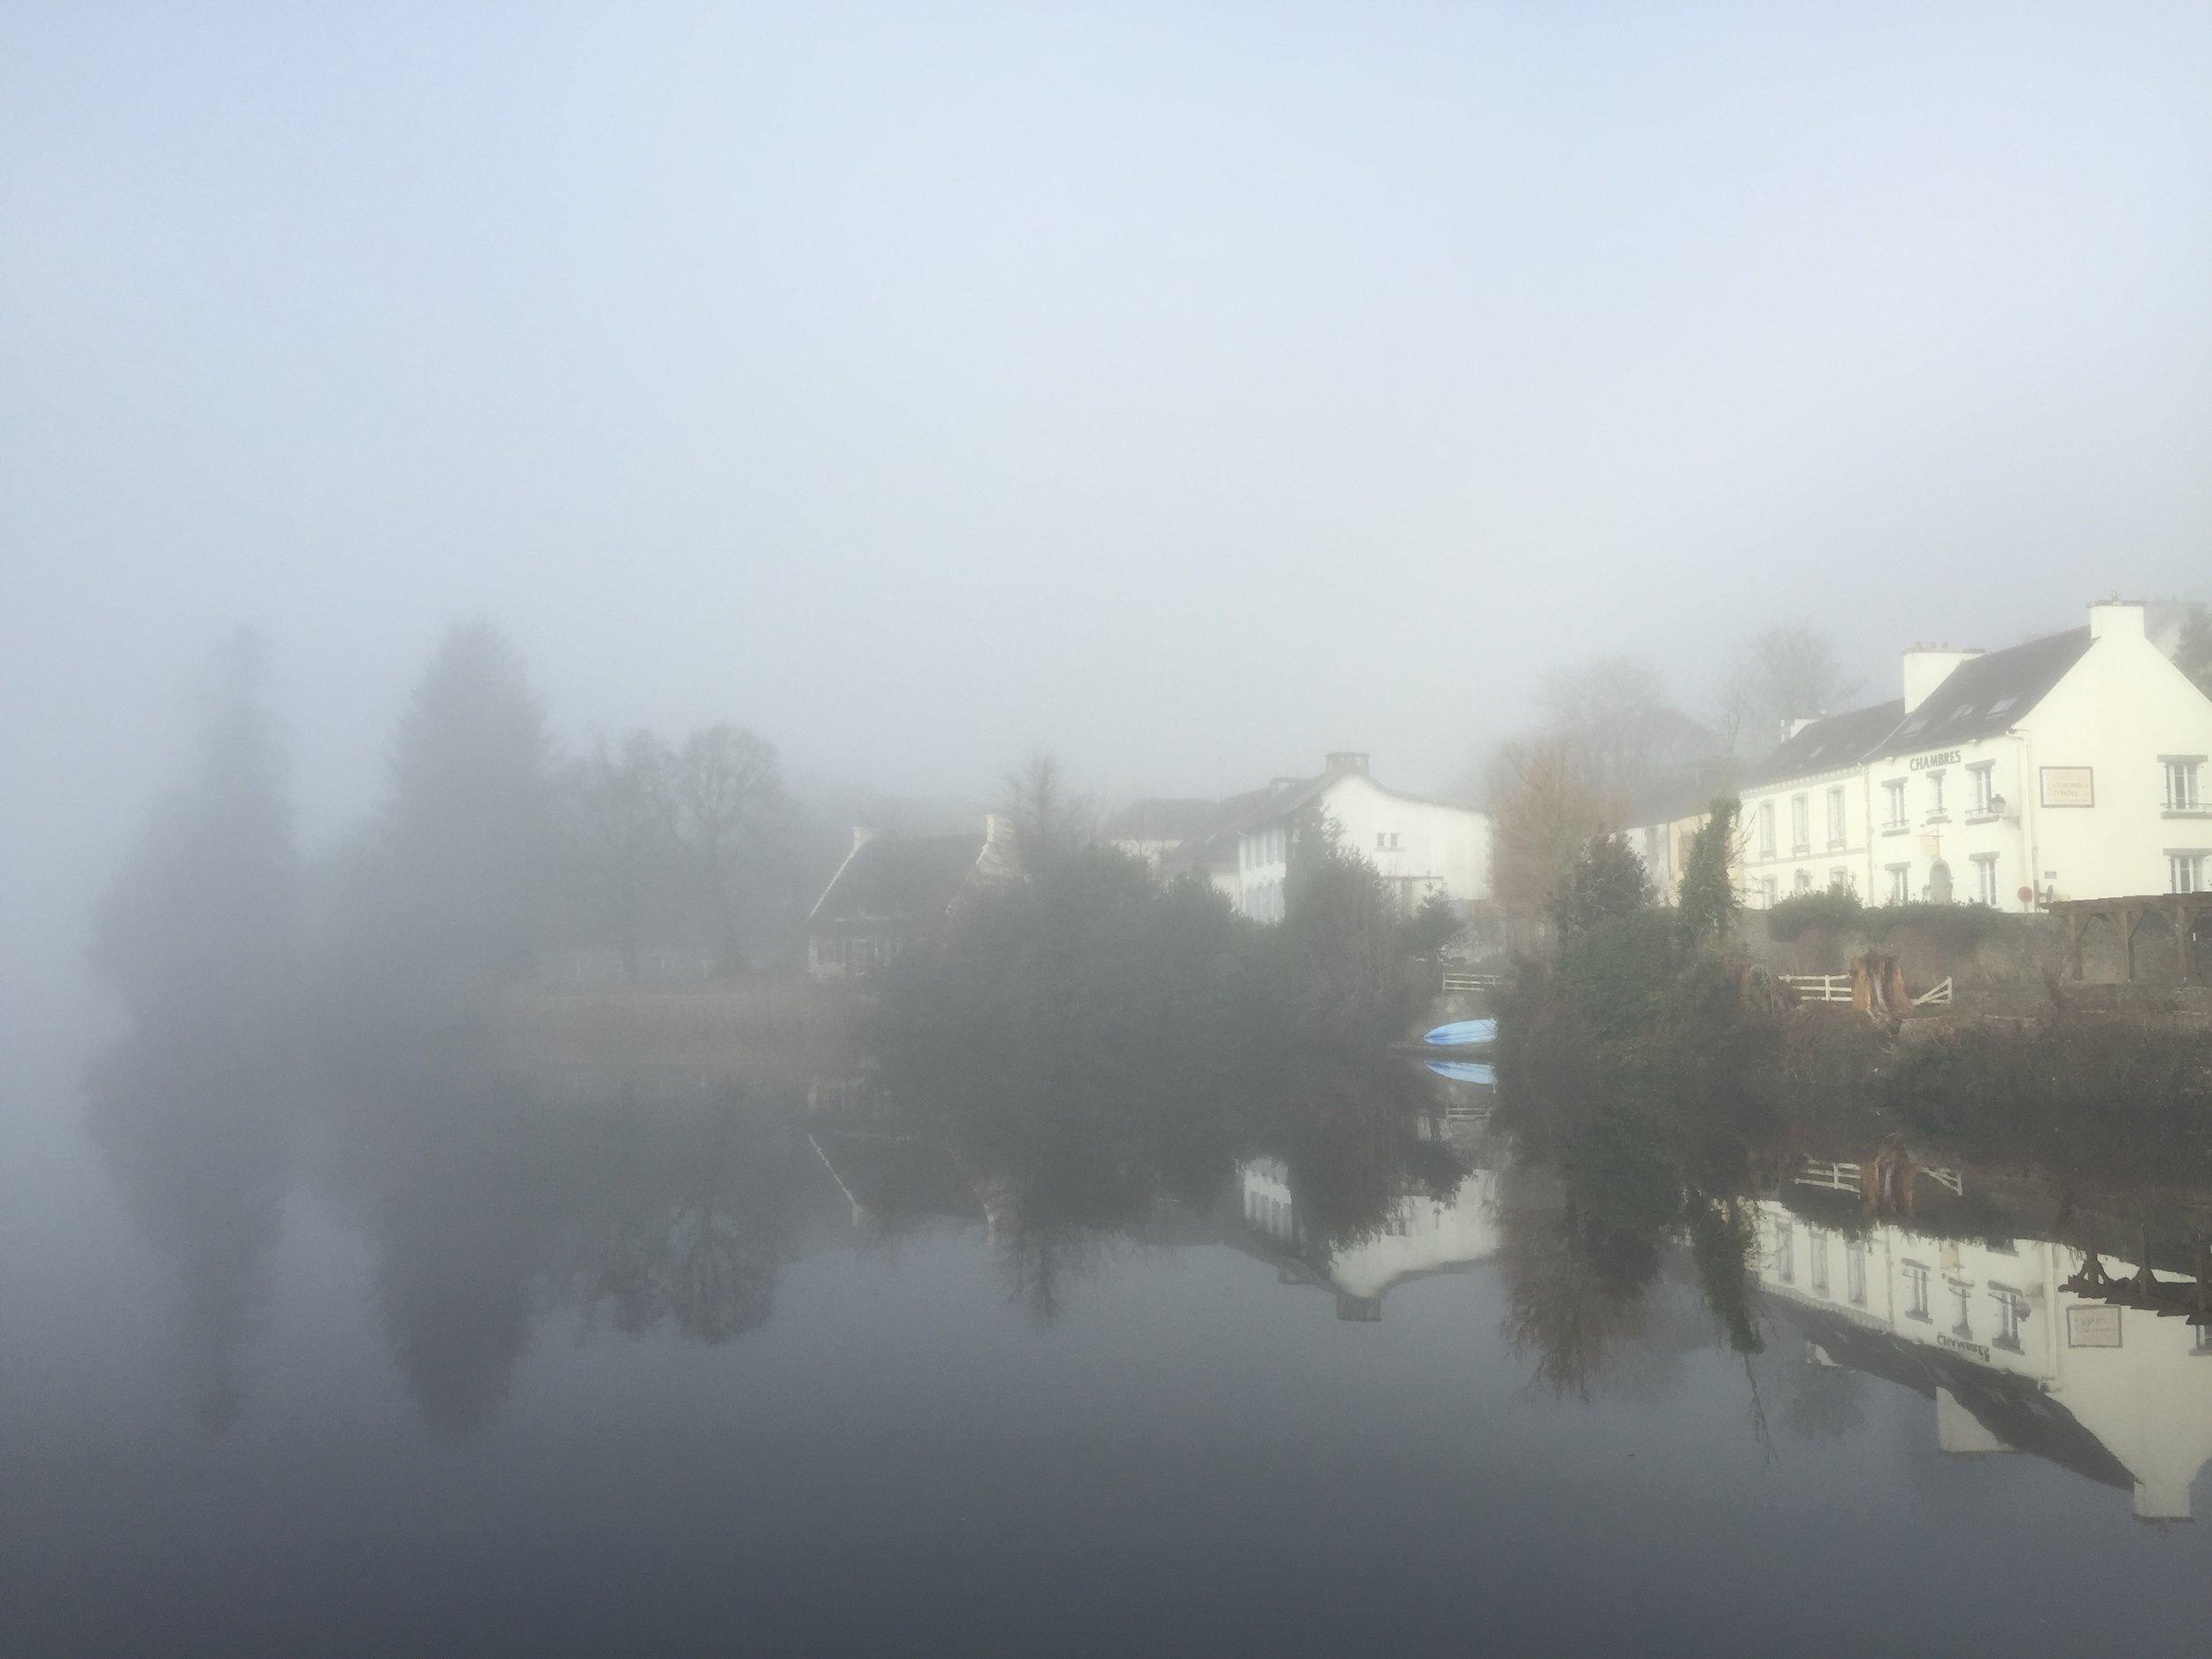 Misty Lake Huelgoat, Brittany France